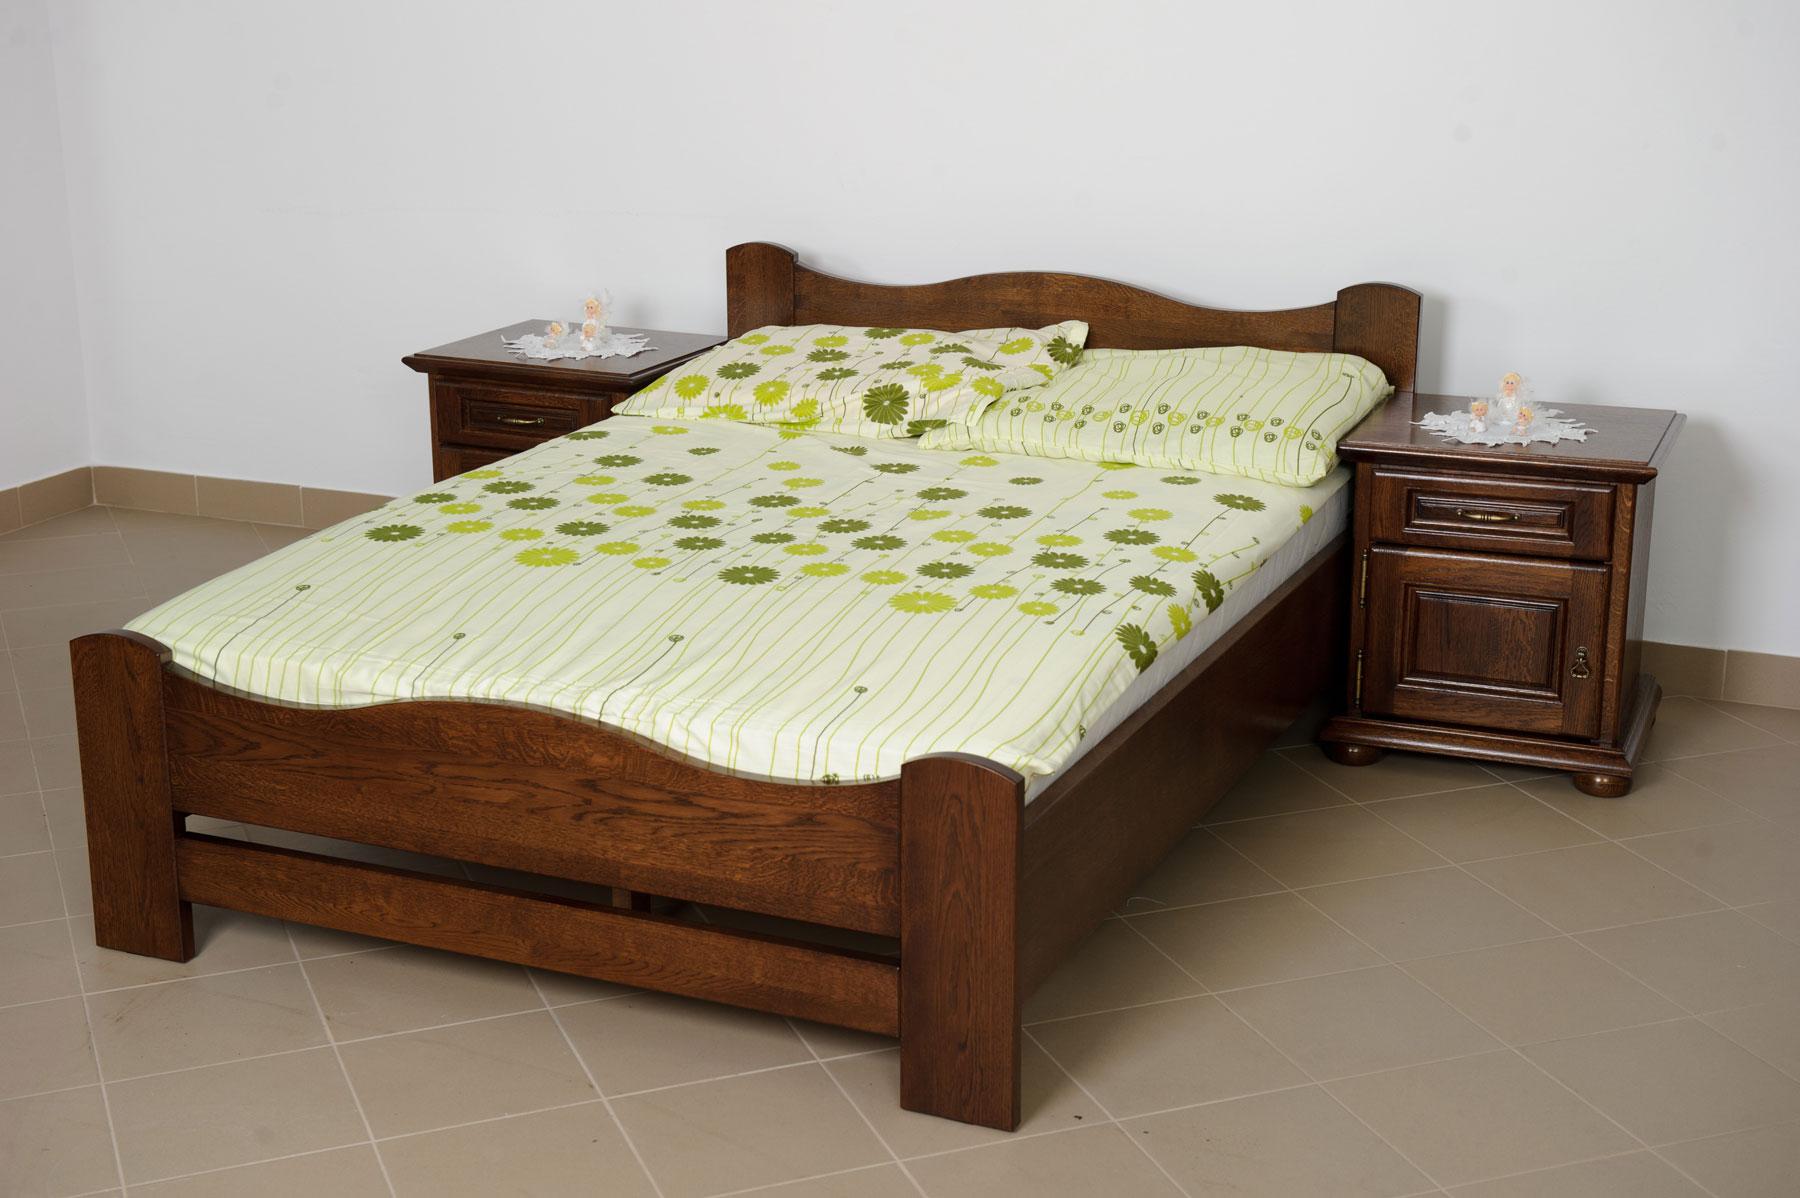 Dubová postel Fal